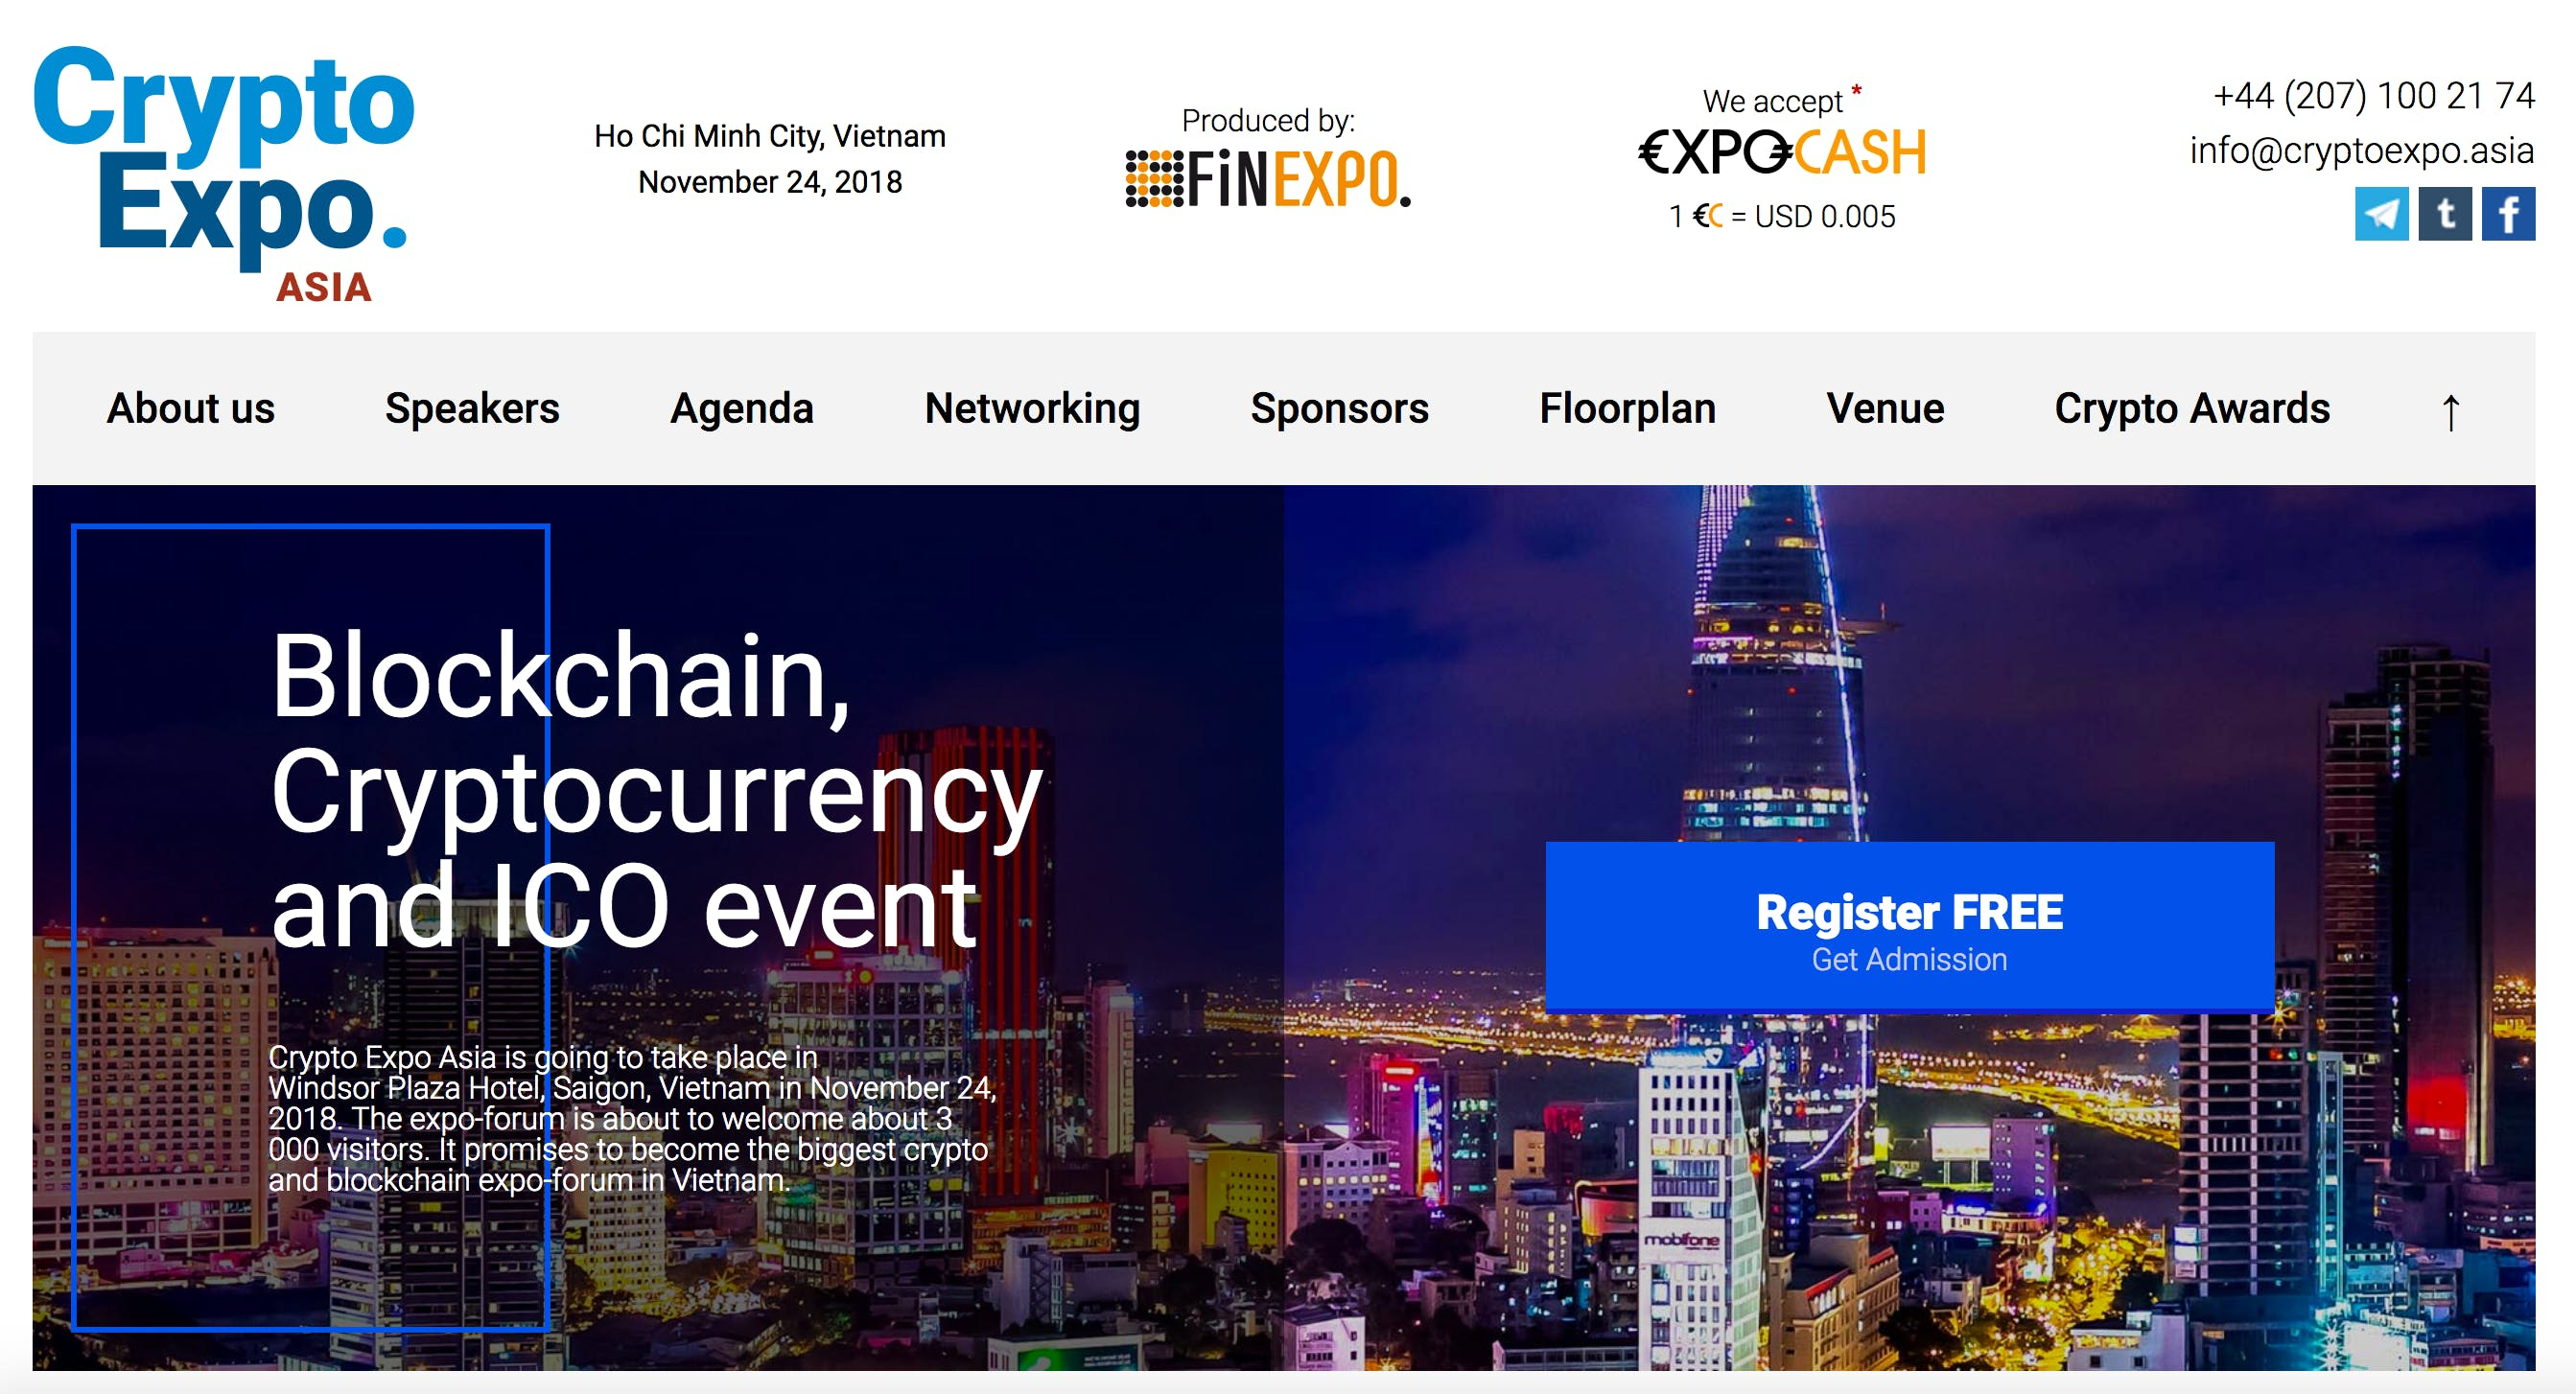 Crypto Expo Asia 2018 - Vietnam (Financial Ev